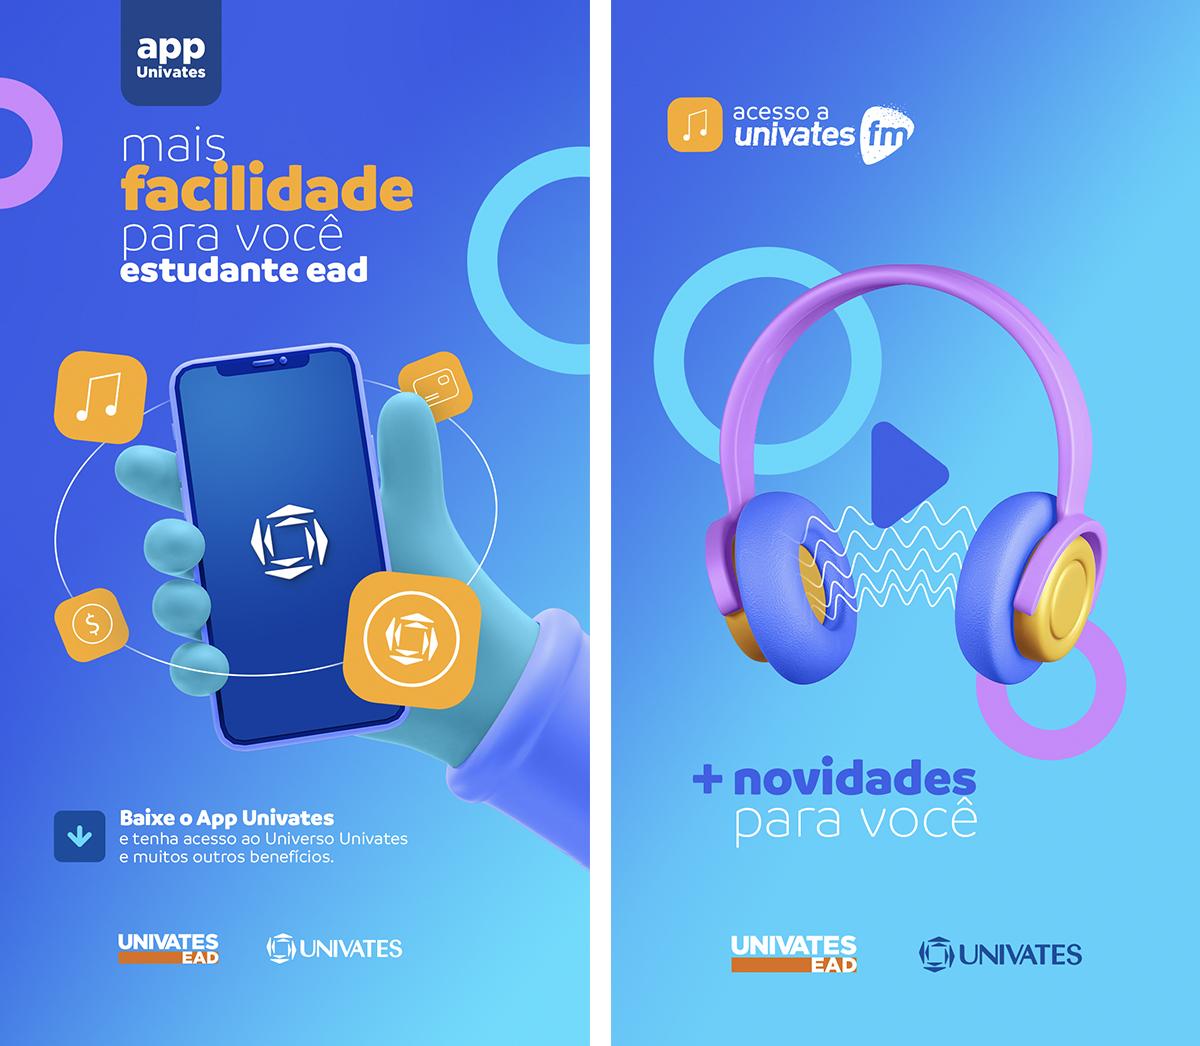 ead univates toyz propaganda agencia publicidade comunicacao marketing brasil encantado lajeado rs campanha publicitaria digital